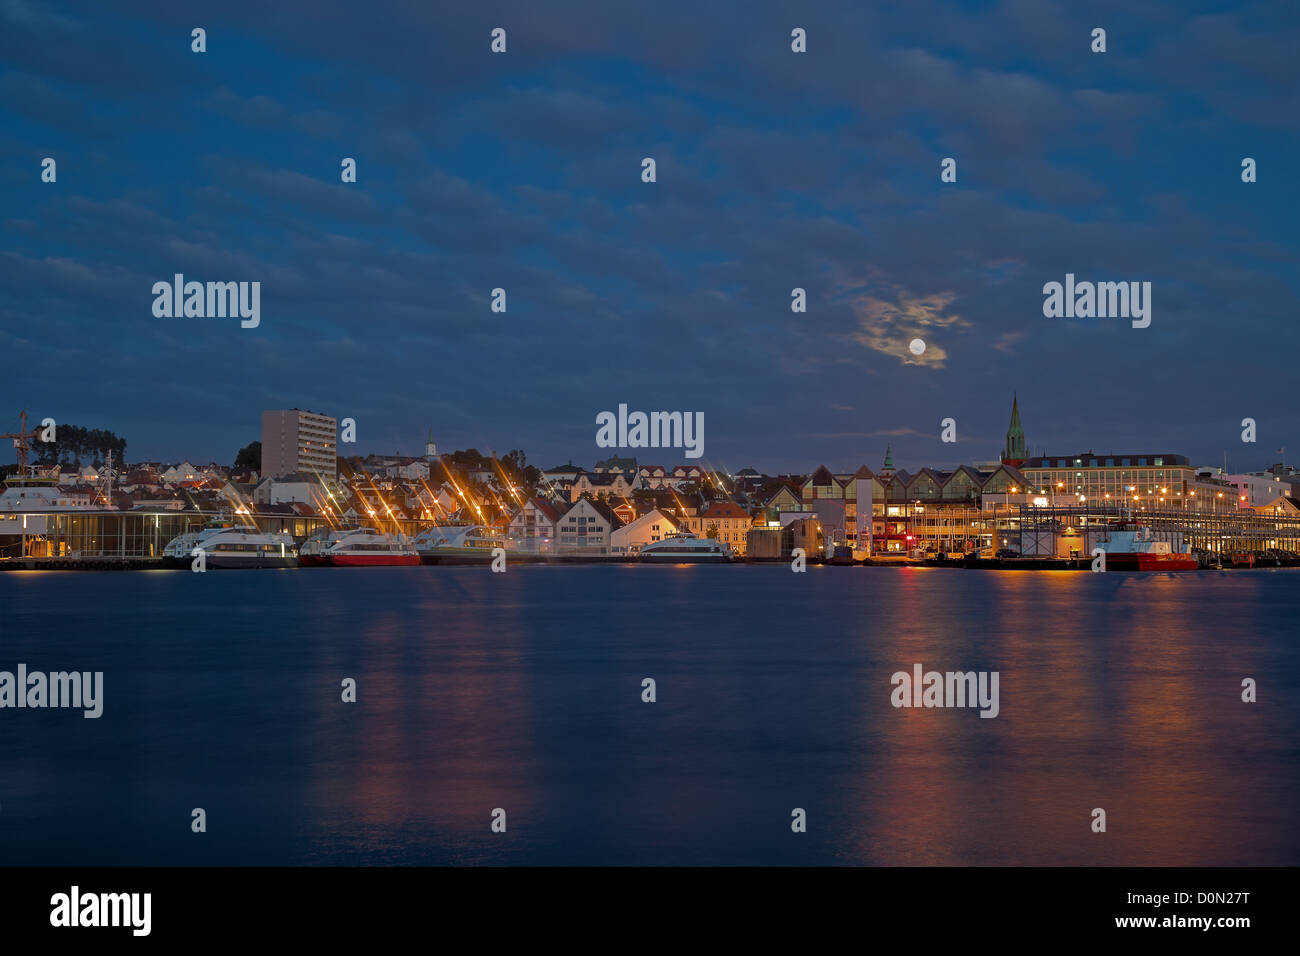 Nacht Panorama der Hafenstadt Stavanger, Norwegen. Stockfoto